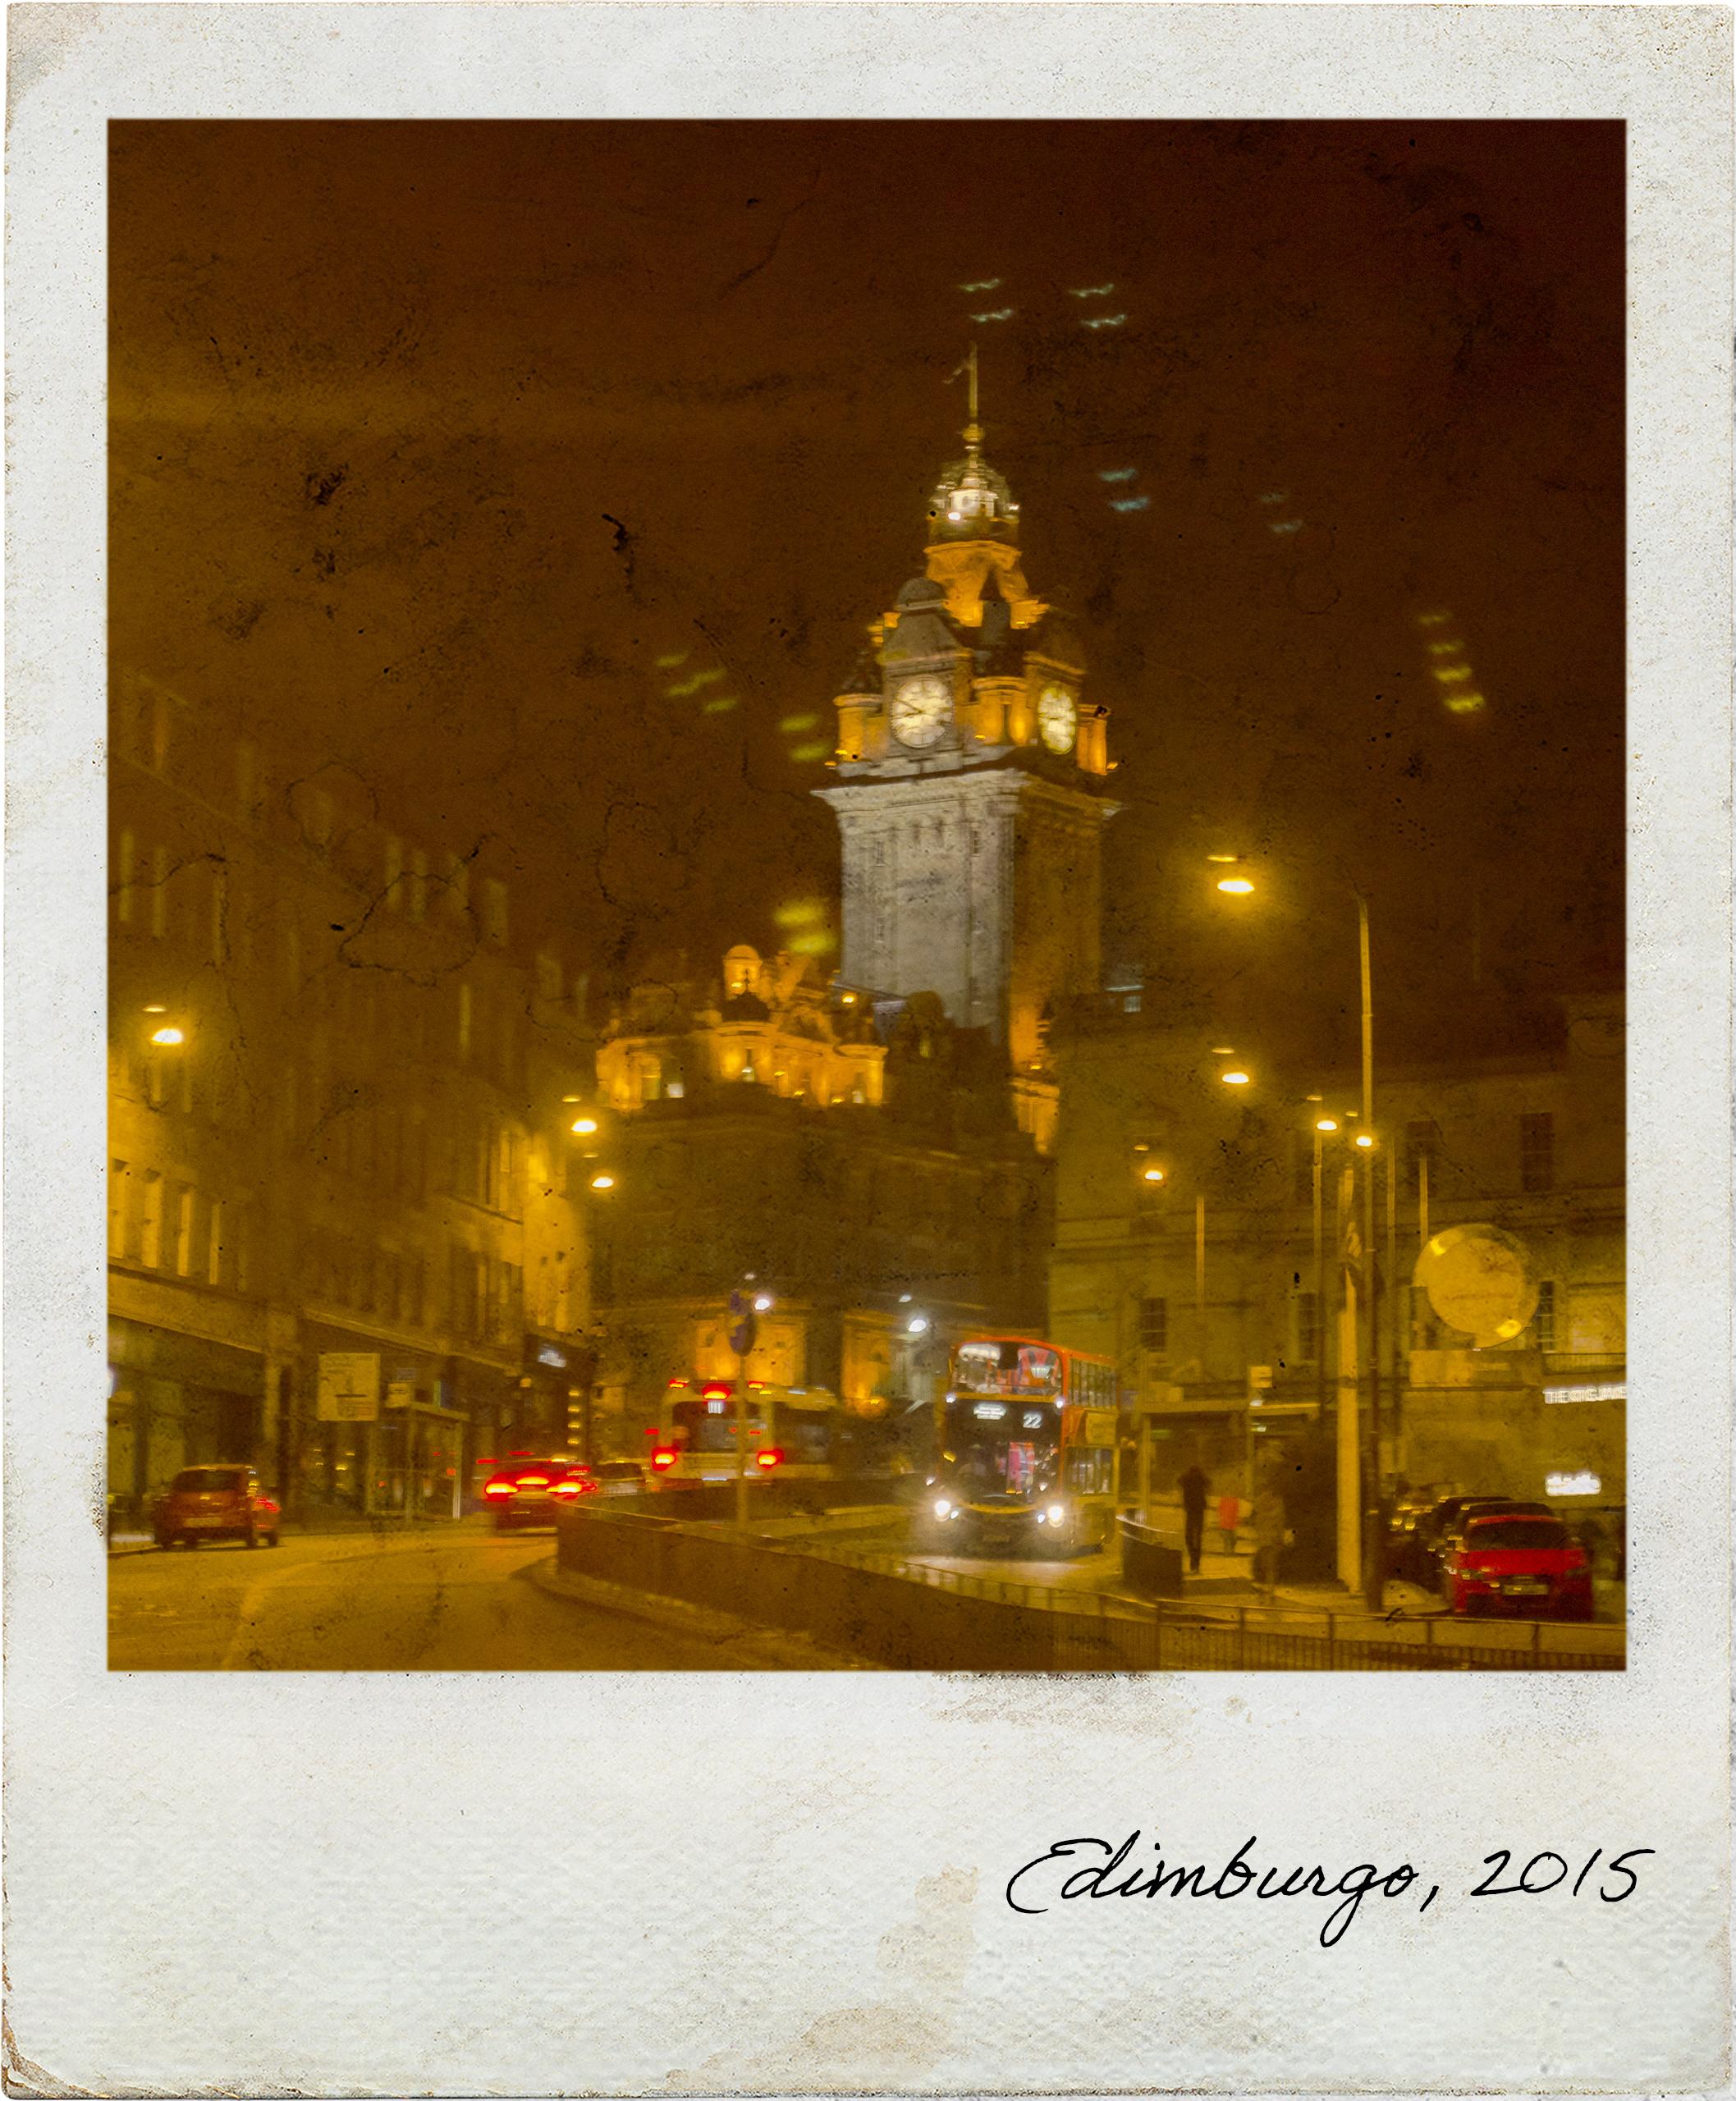 Somewhere in Edinburgh at night